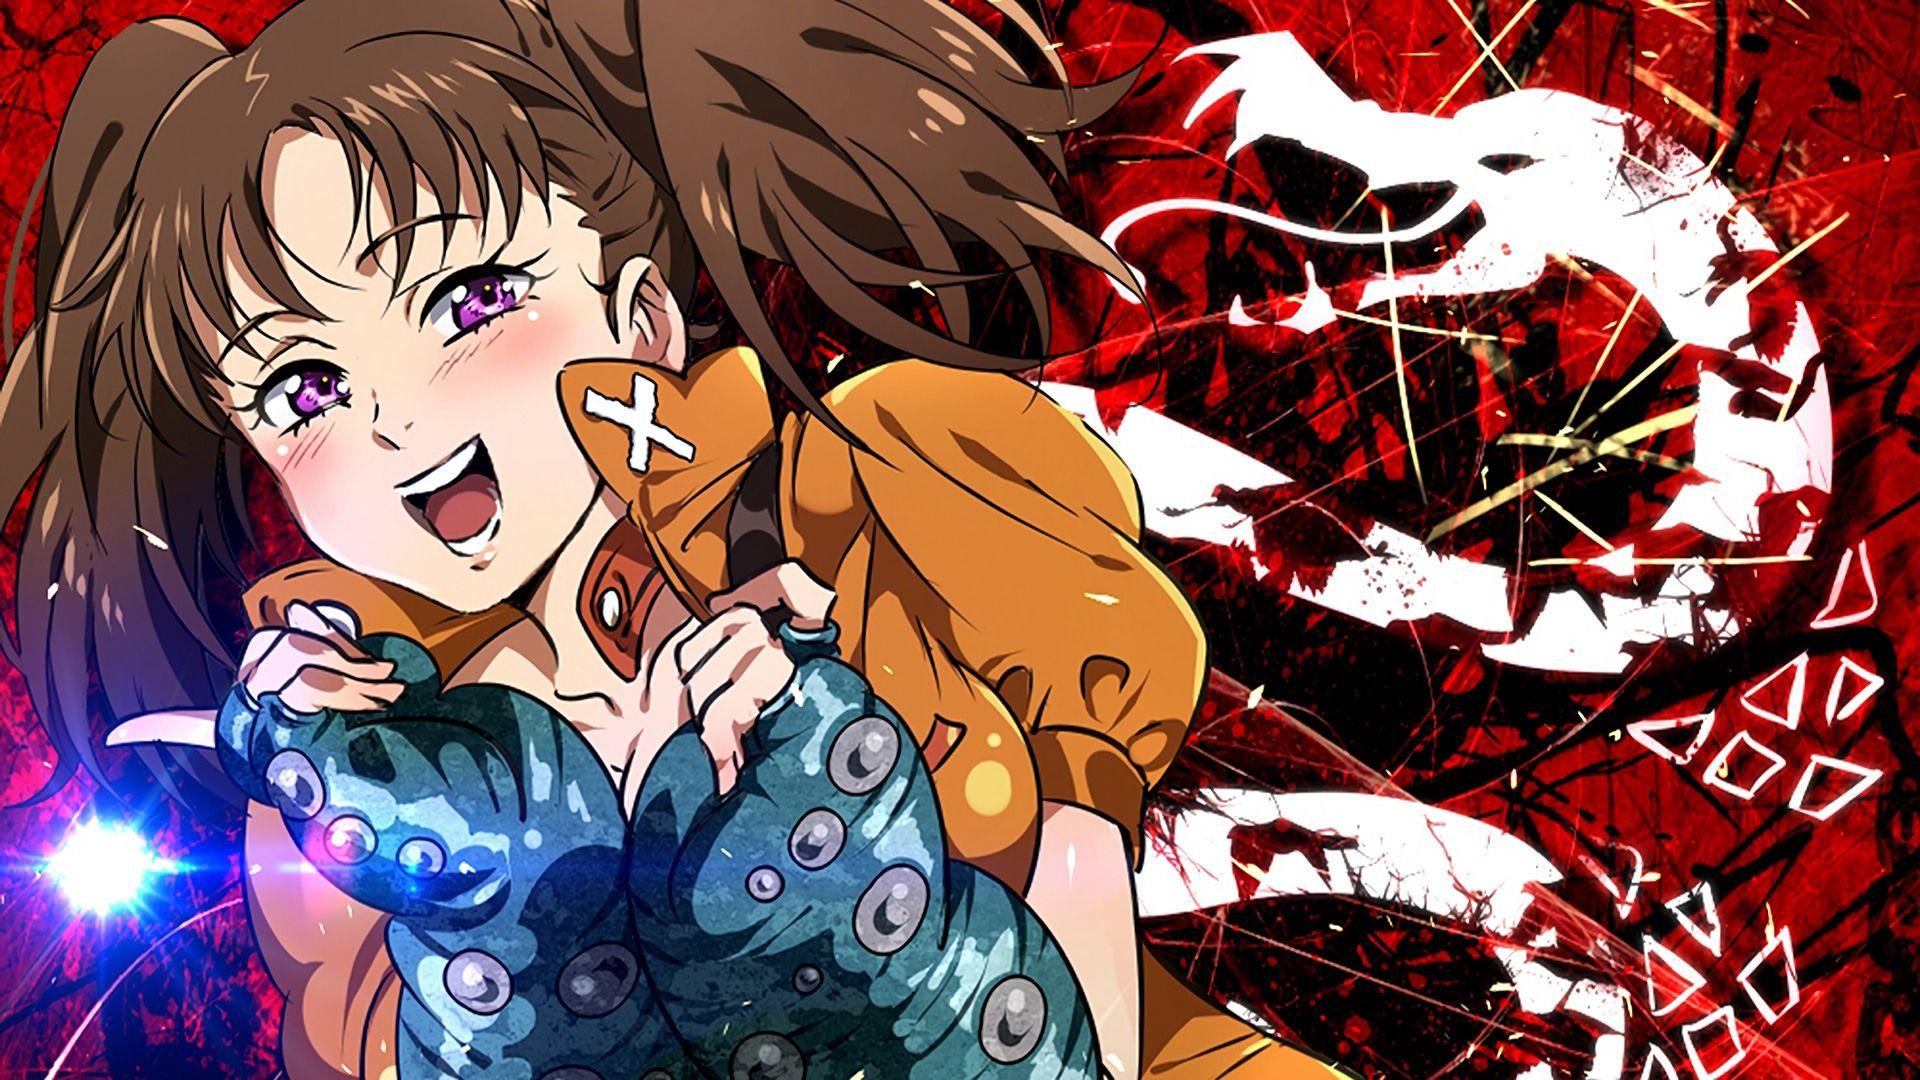 {title} imagens) Nanatsu, Super anime, Anime meninas